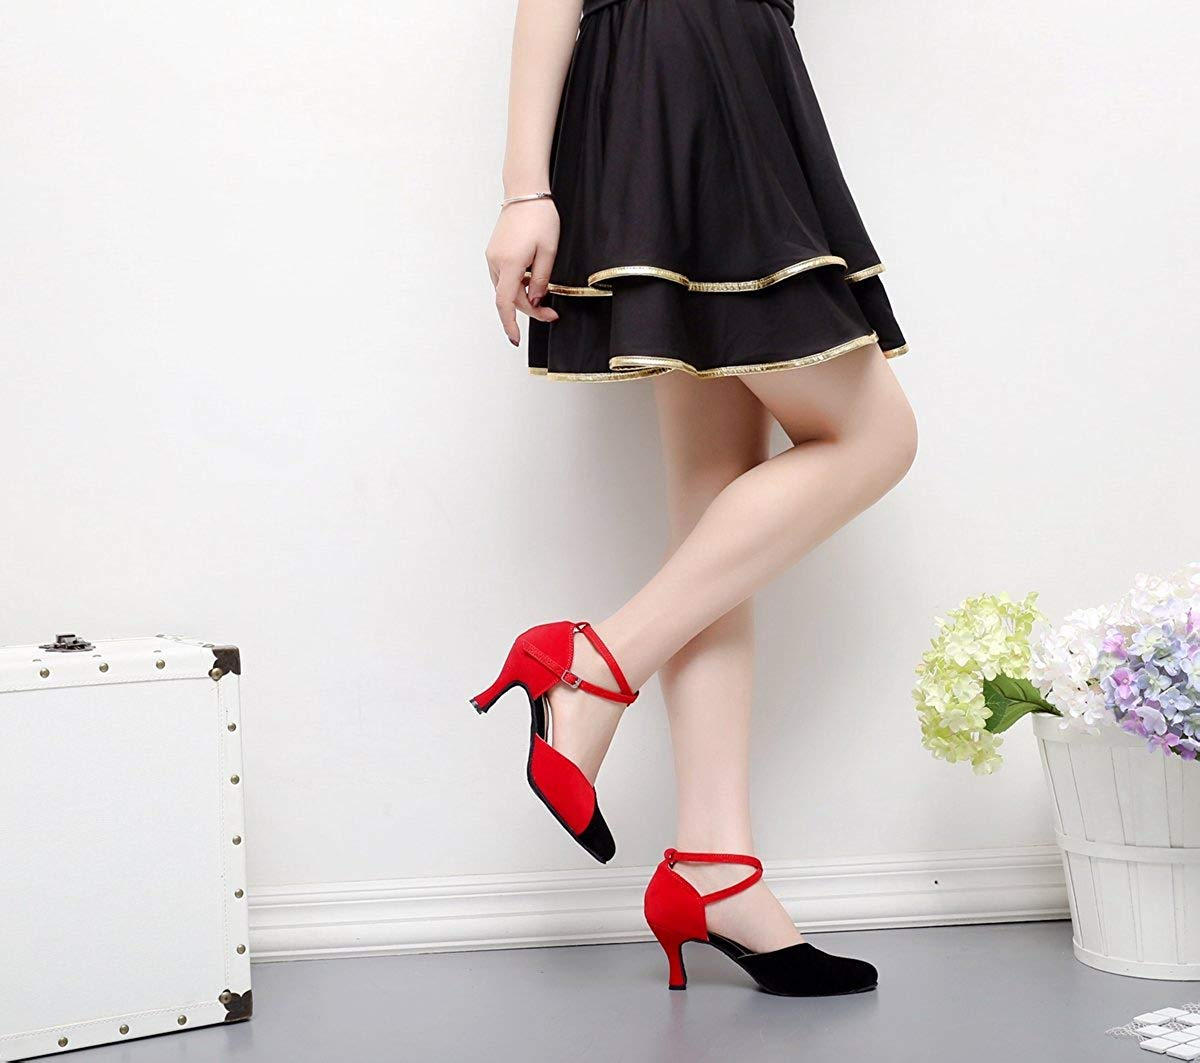 Qiusa TJ7136 TJ7136 TJ7136 Damen Mädchen Knöchelriemen Rot Wildleder Latin Dancing Schuhe Formale Partei Pumps UK 6,5 (Farbe   - Größe   -) d9879c